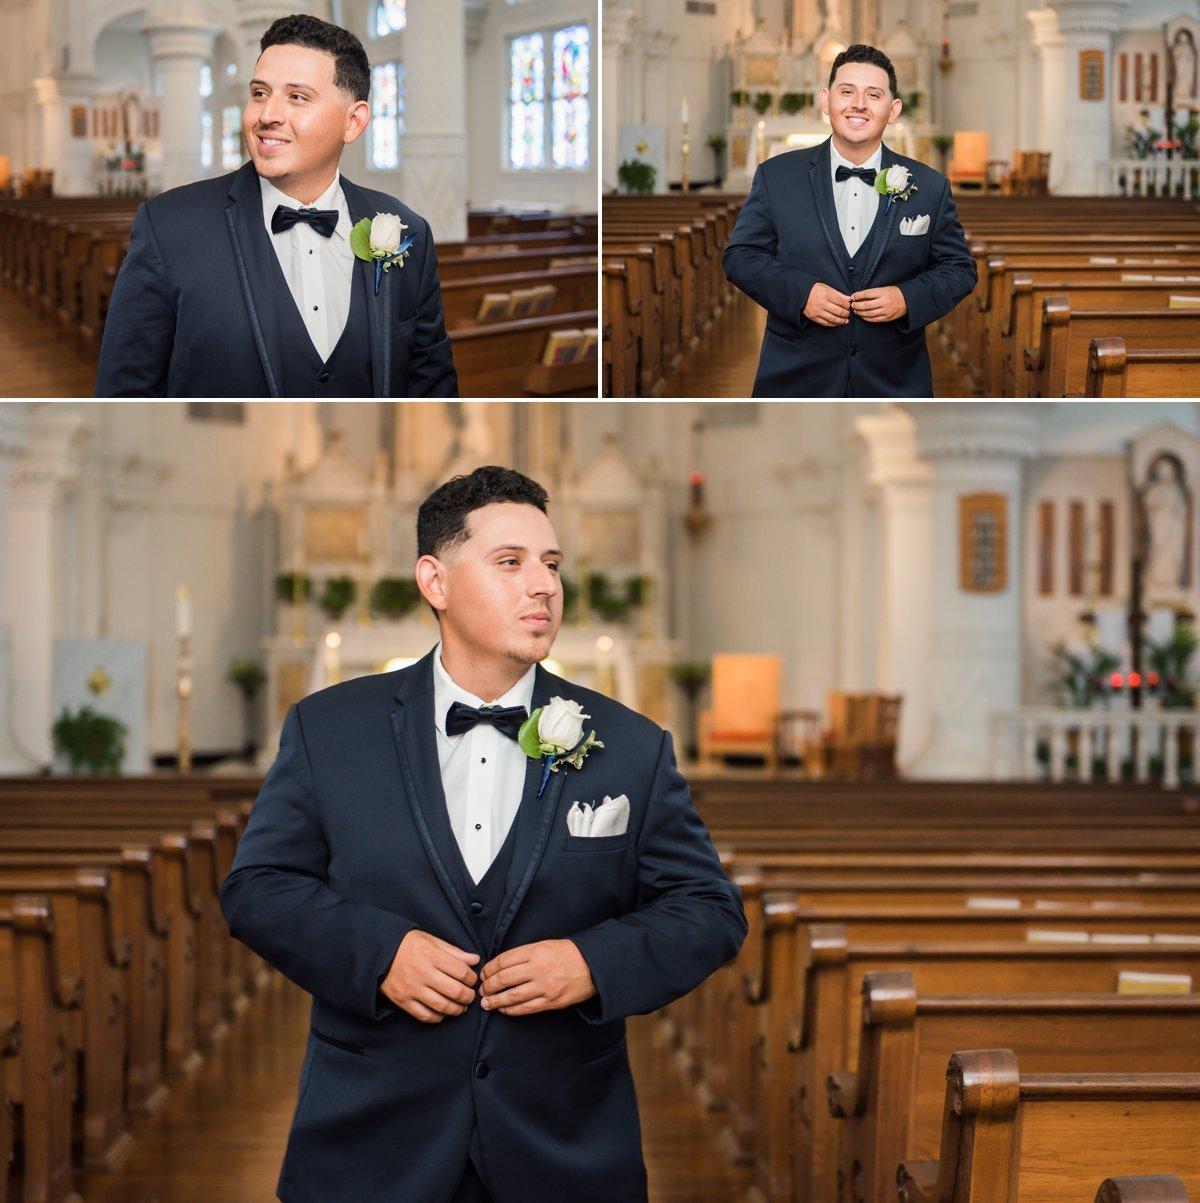 Monica-JJ Wedding 12